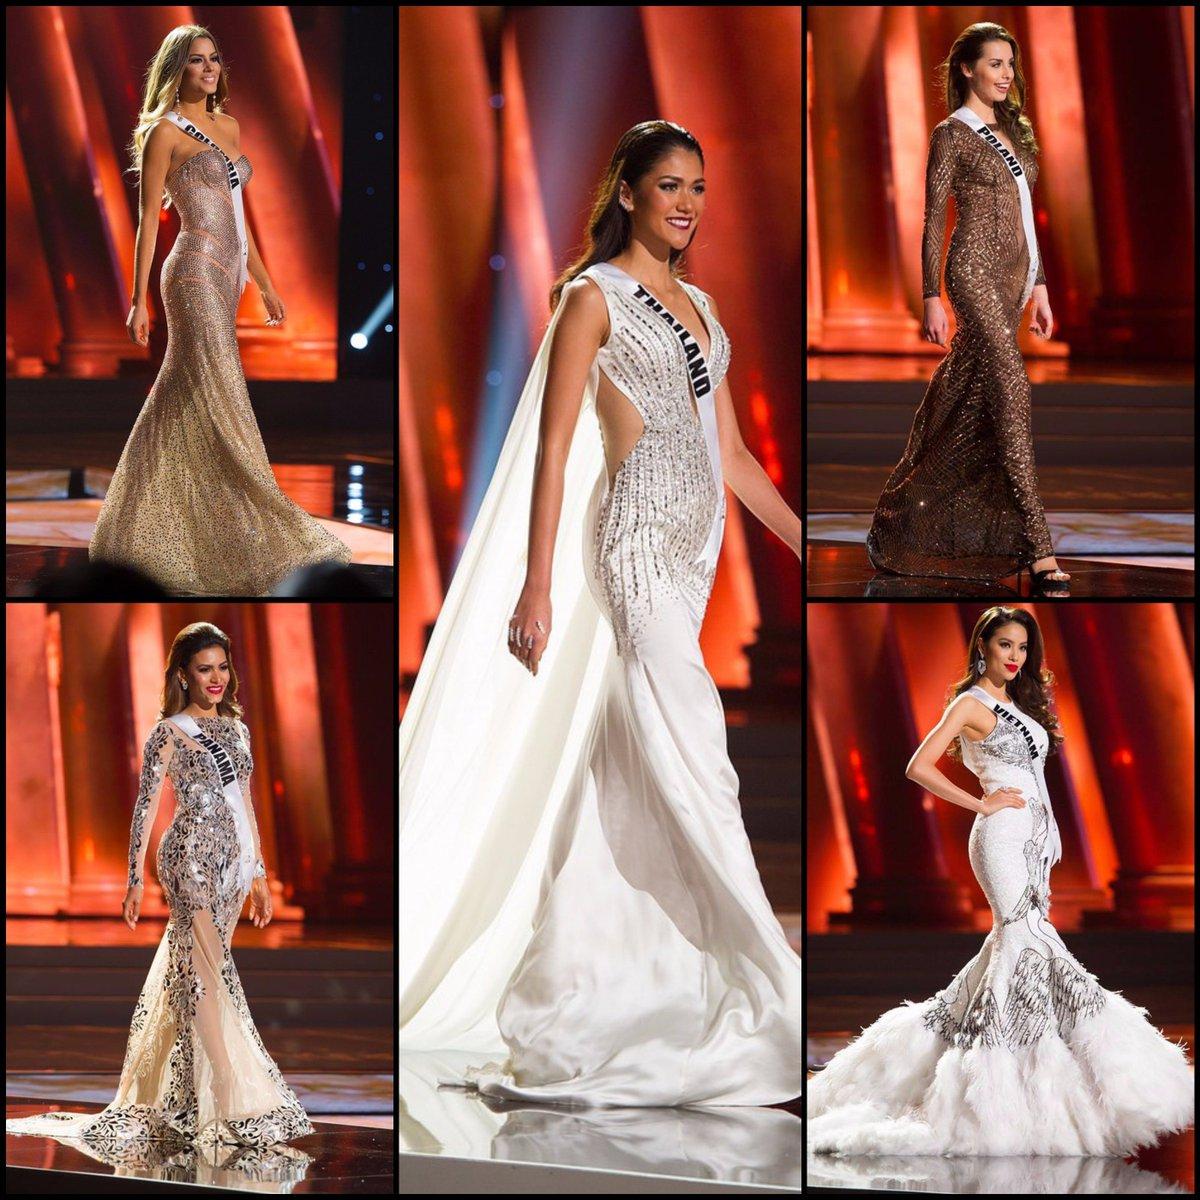 SASHES & TIARAS: My Top 15 BEST GOWNS of #MissUniverse2015 @MissUniverse Preliminaries: https://t.co/D6LhlTZjVY https://t.co/JpI2U7Tc1I